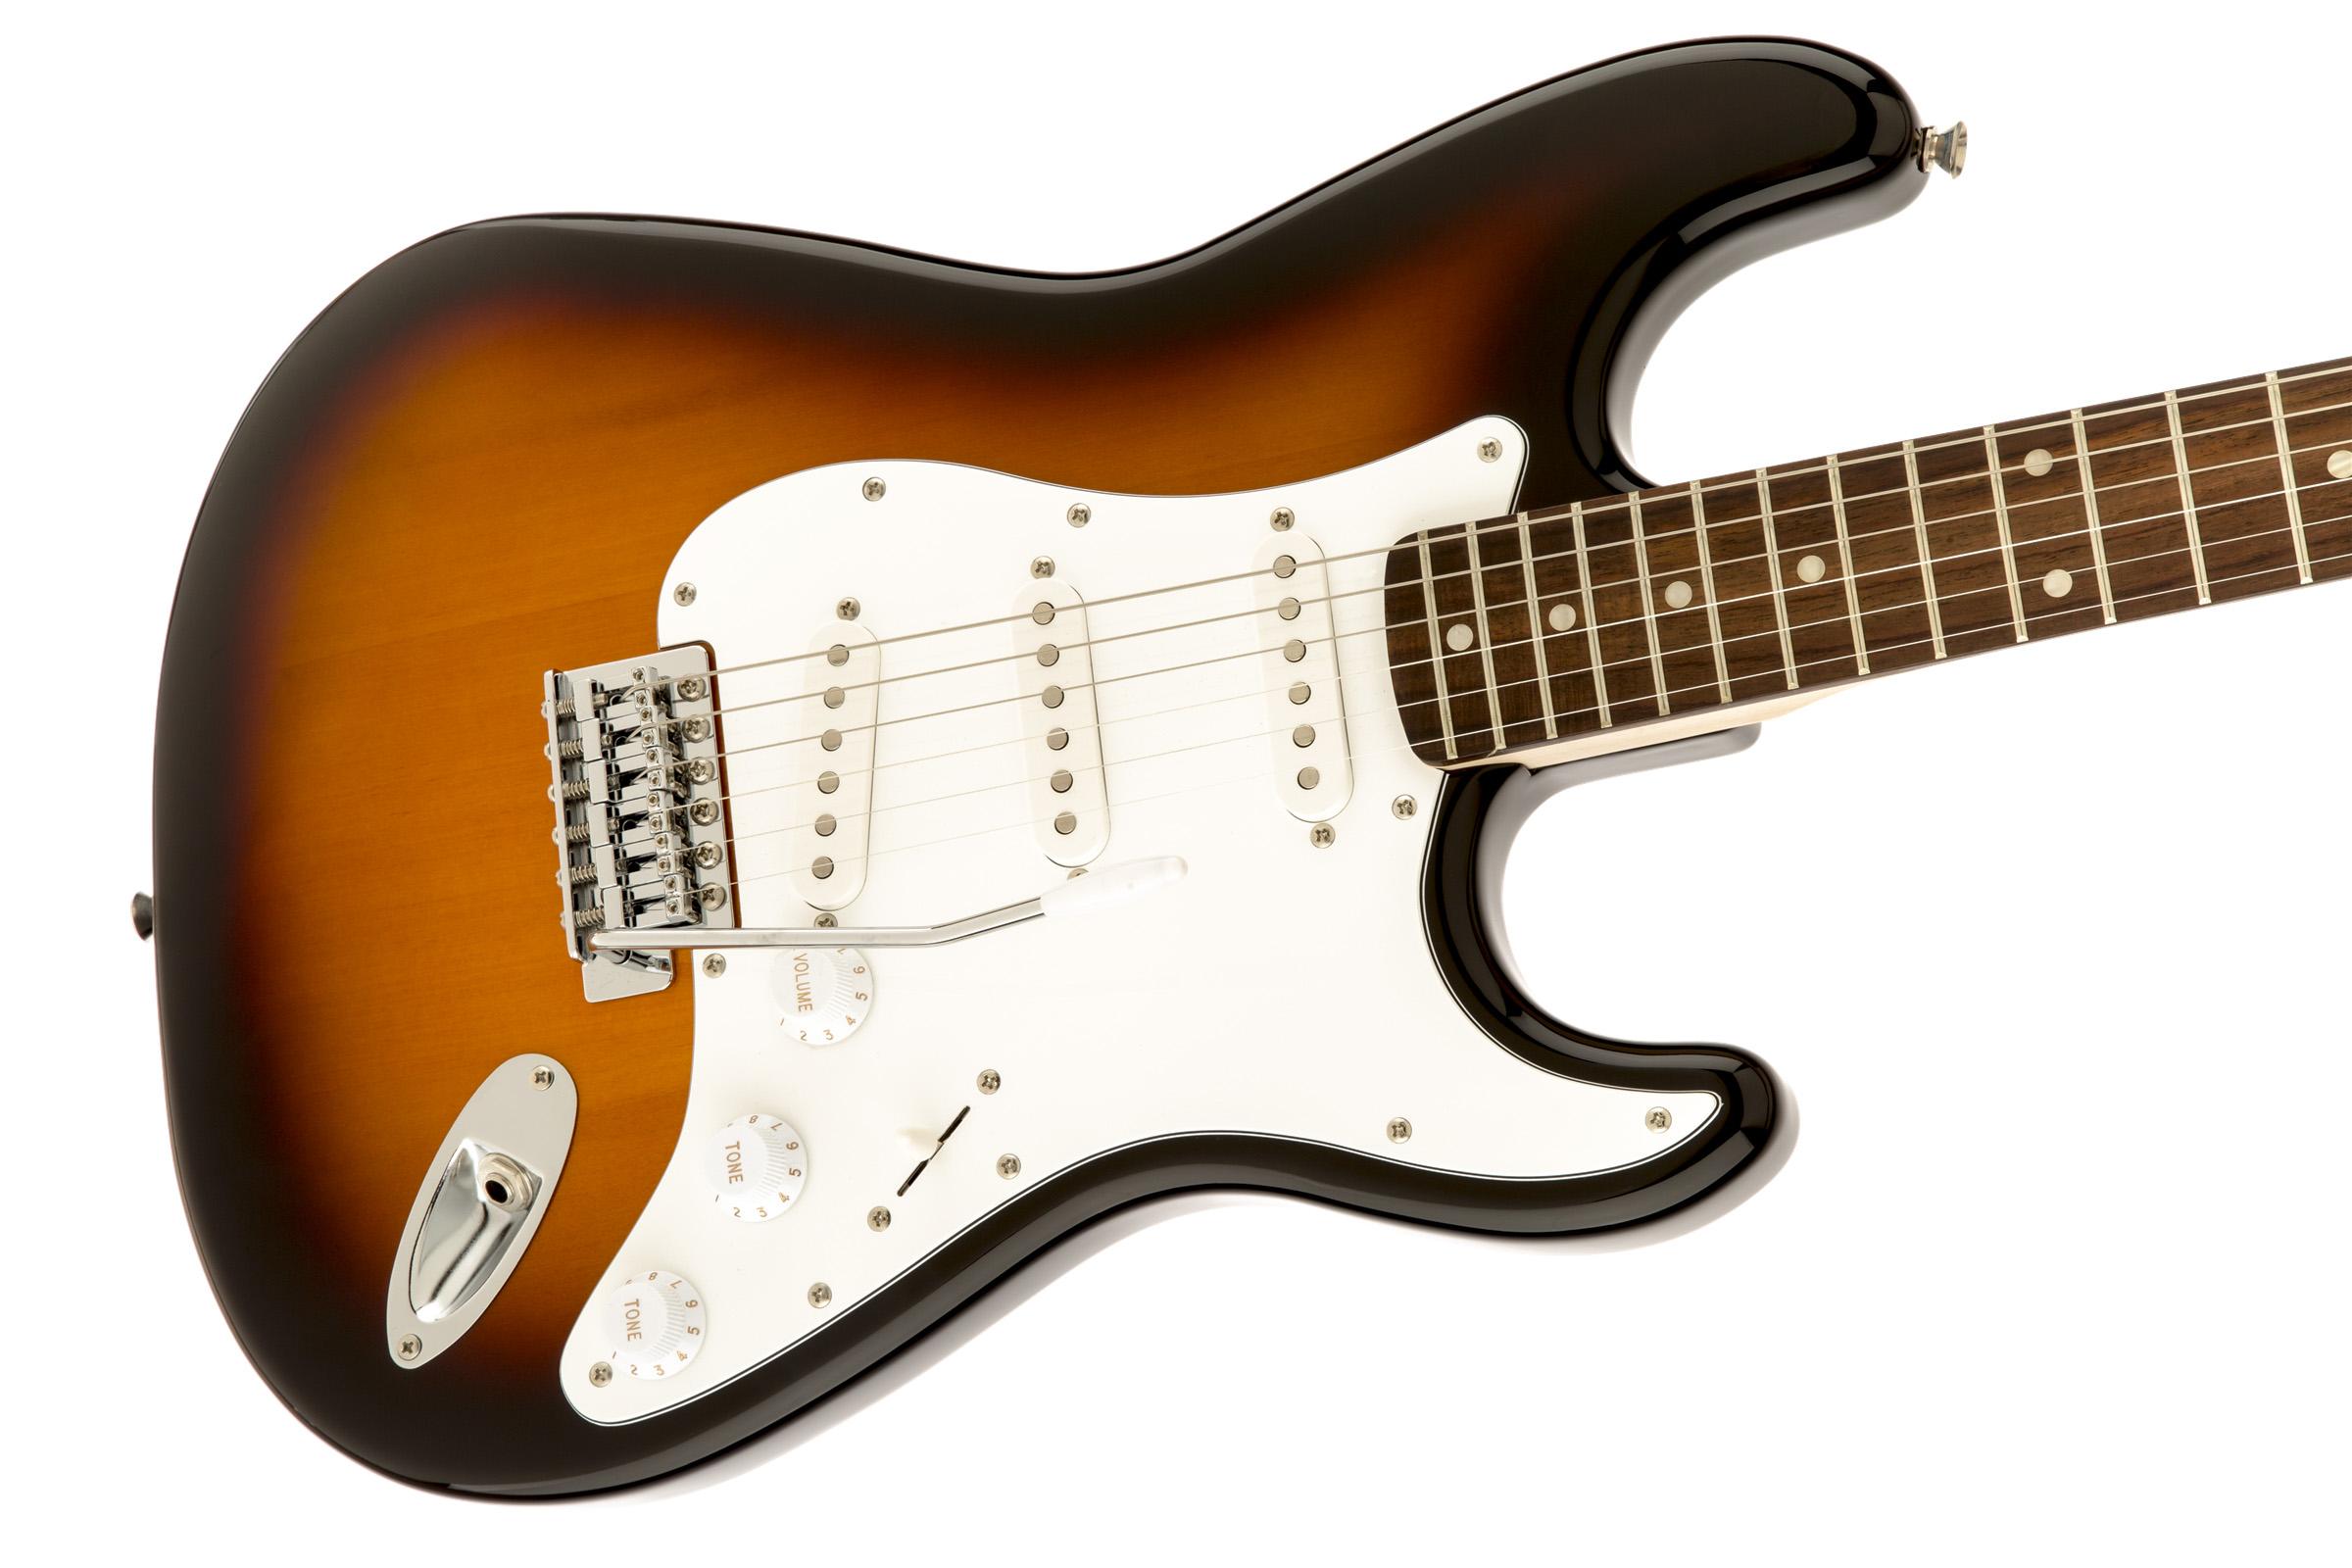 thumbnail 6 - Fender Squier Affinity Stratocaster - Brown Sunburst w/ Frontman 10G Amplifier